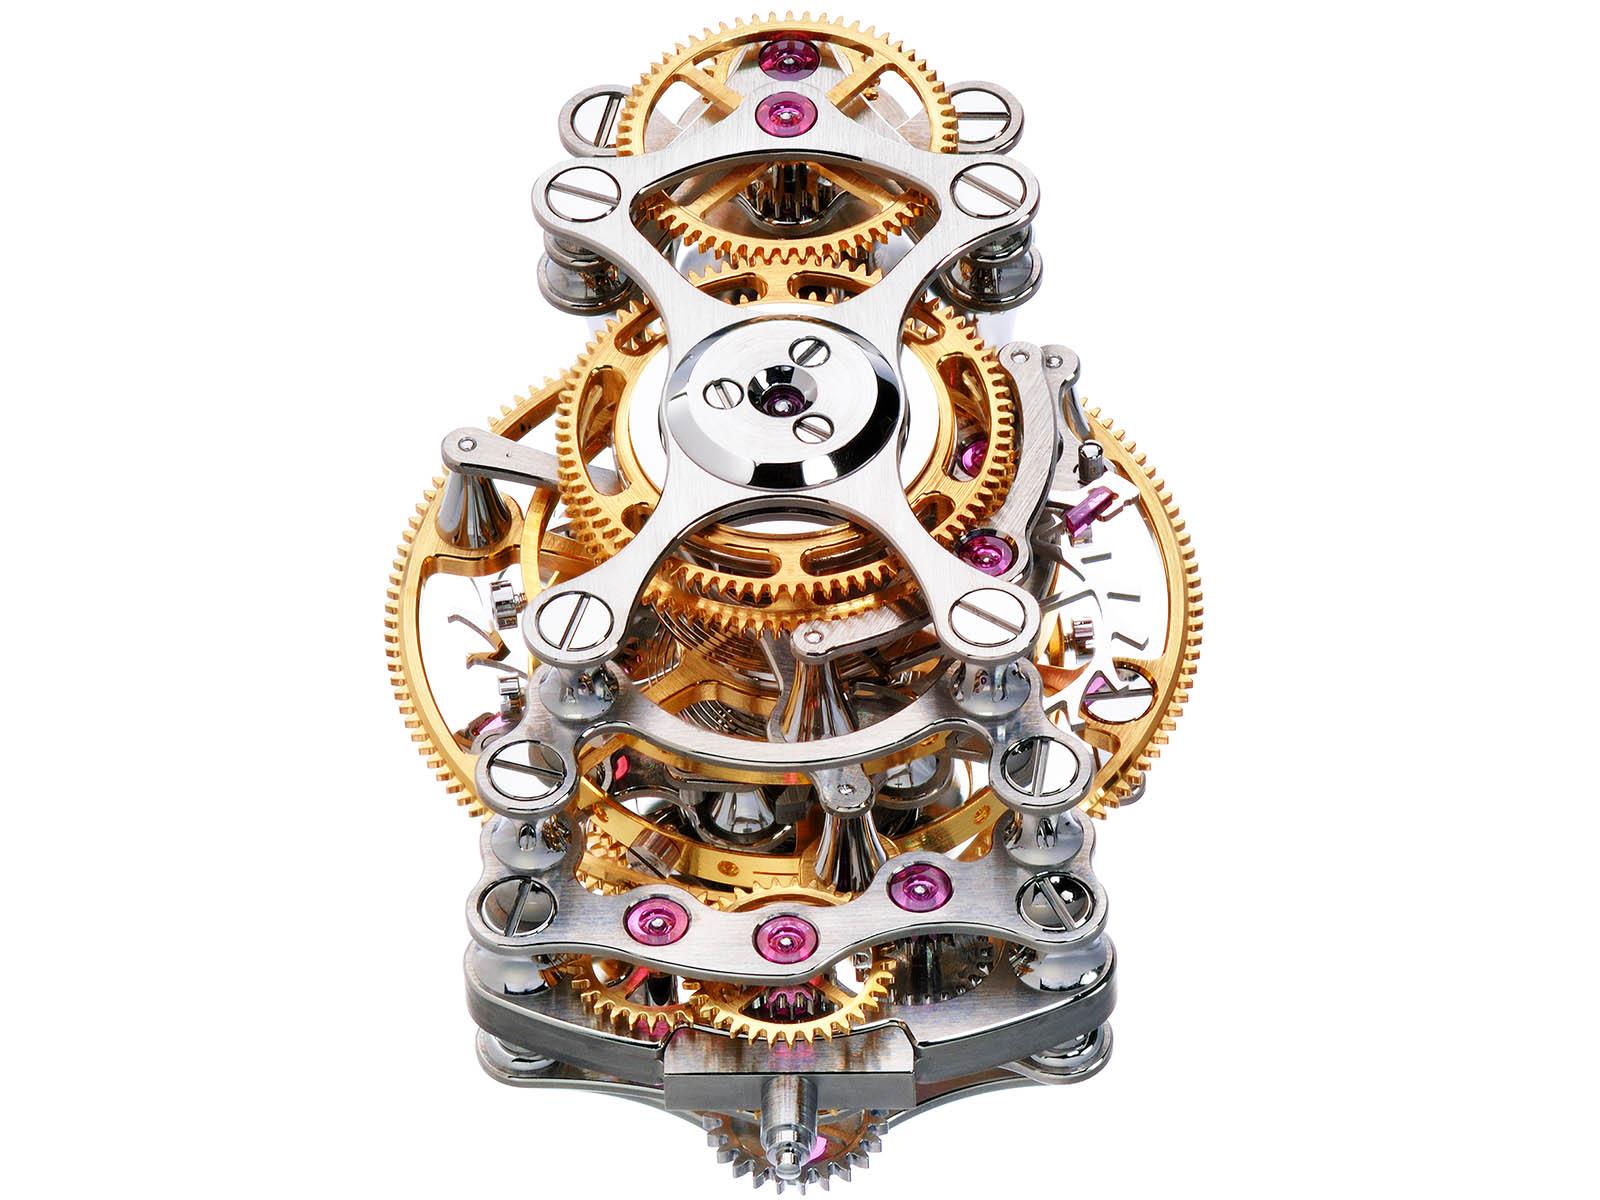 vianney-halter-deep-space-resonance-prototype-5.jpg